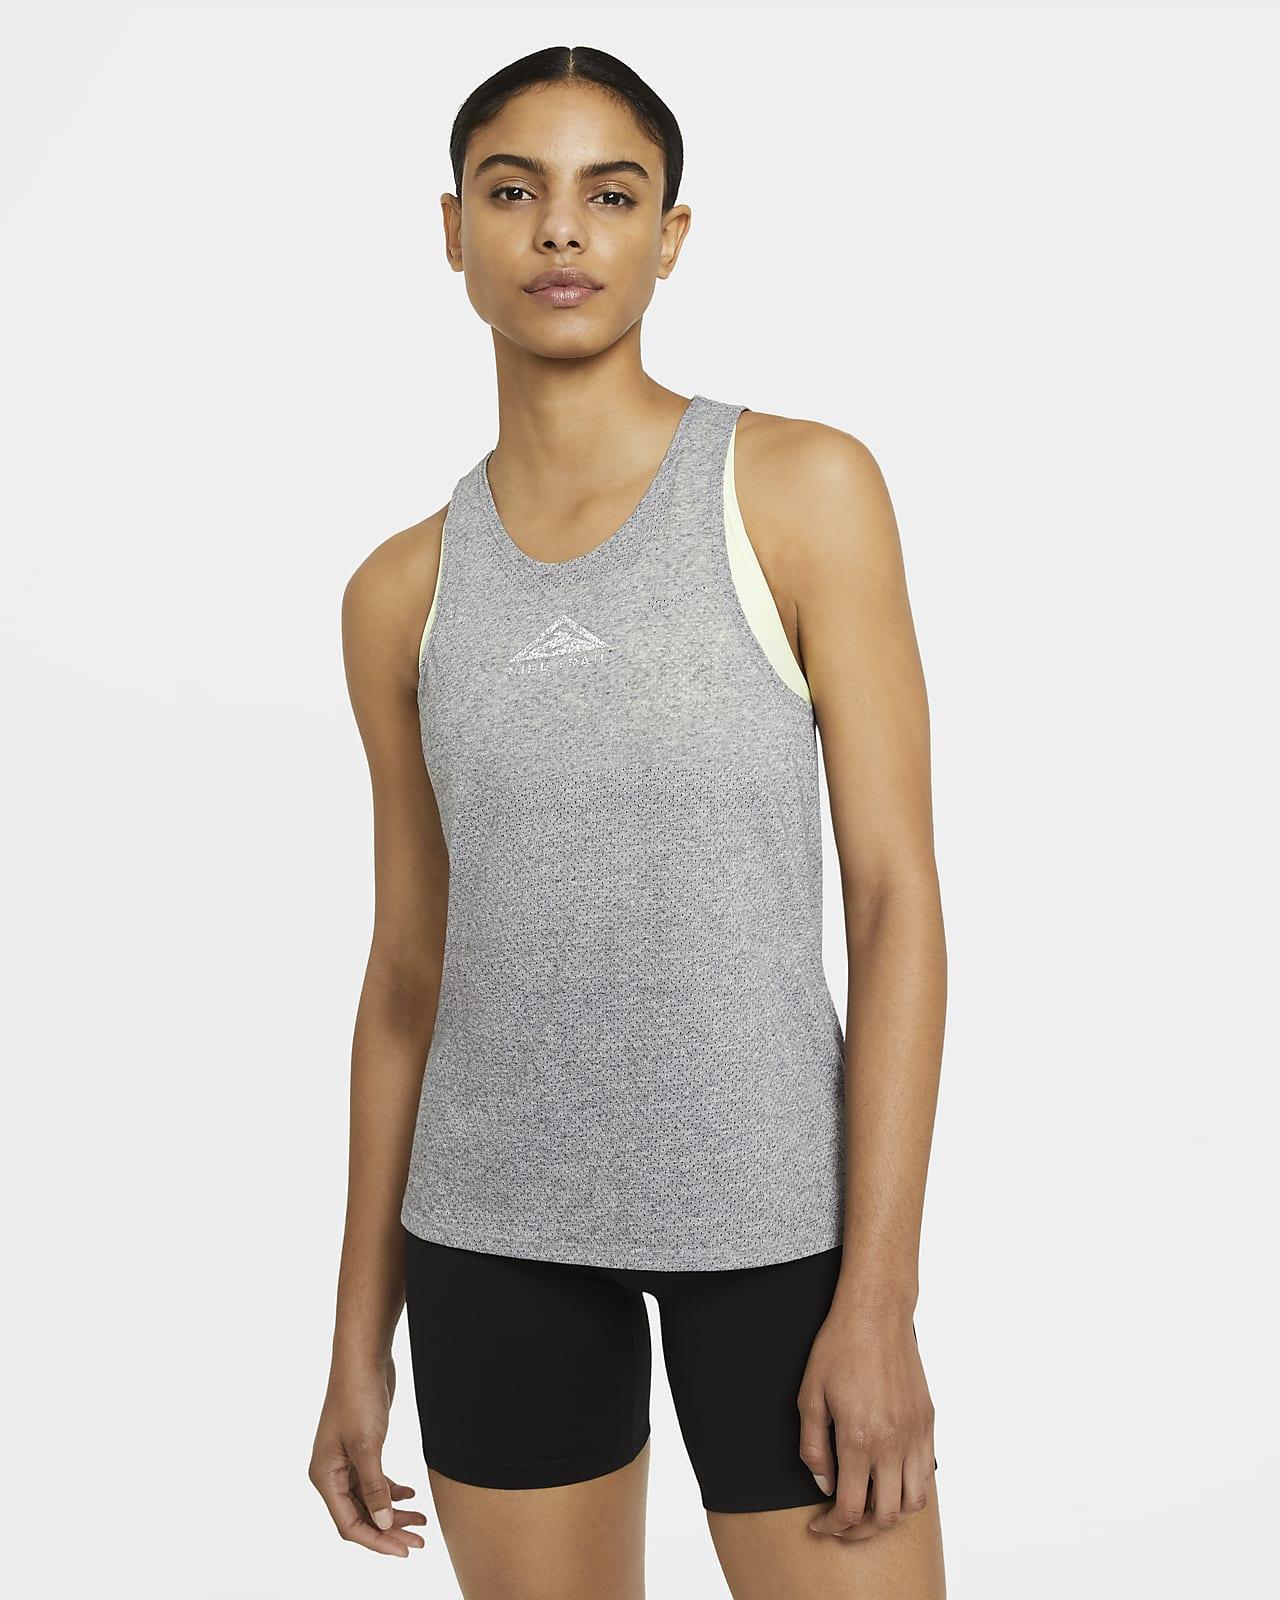 Nike City Sleek Women's Trail Running Tank